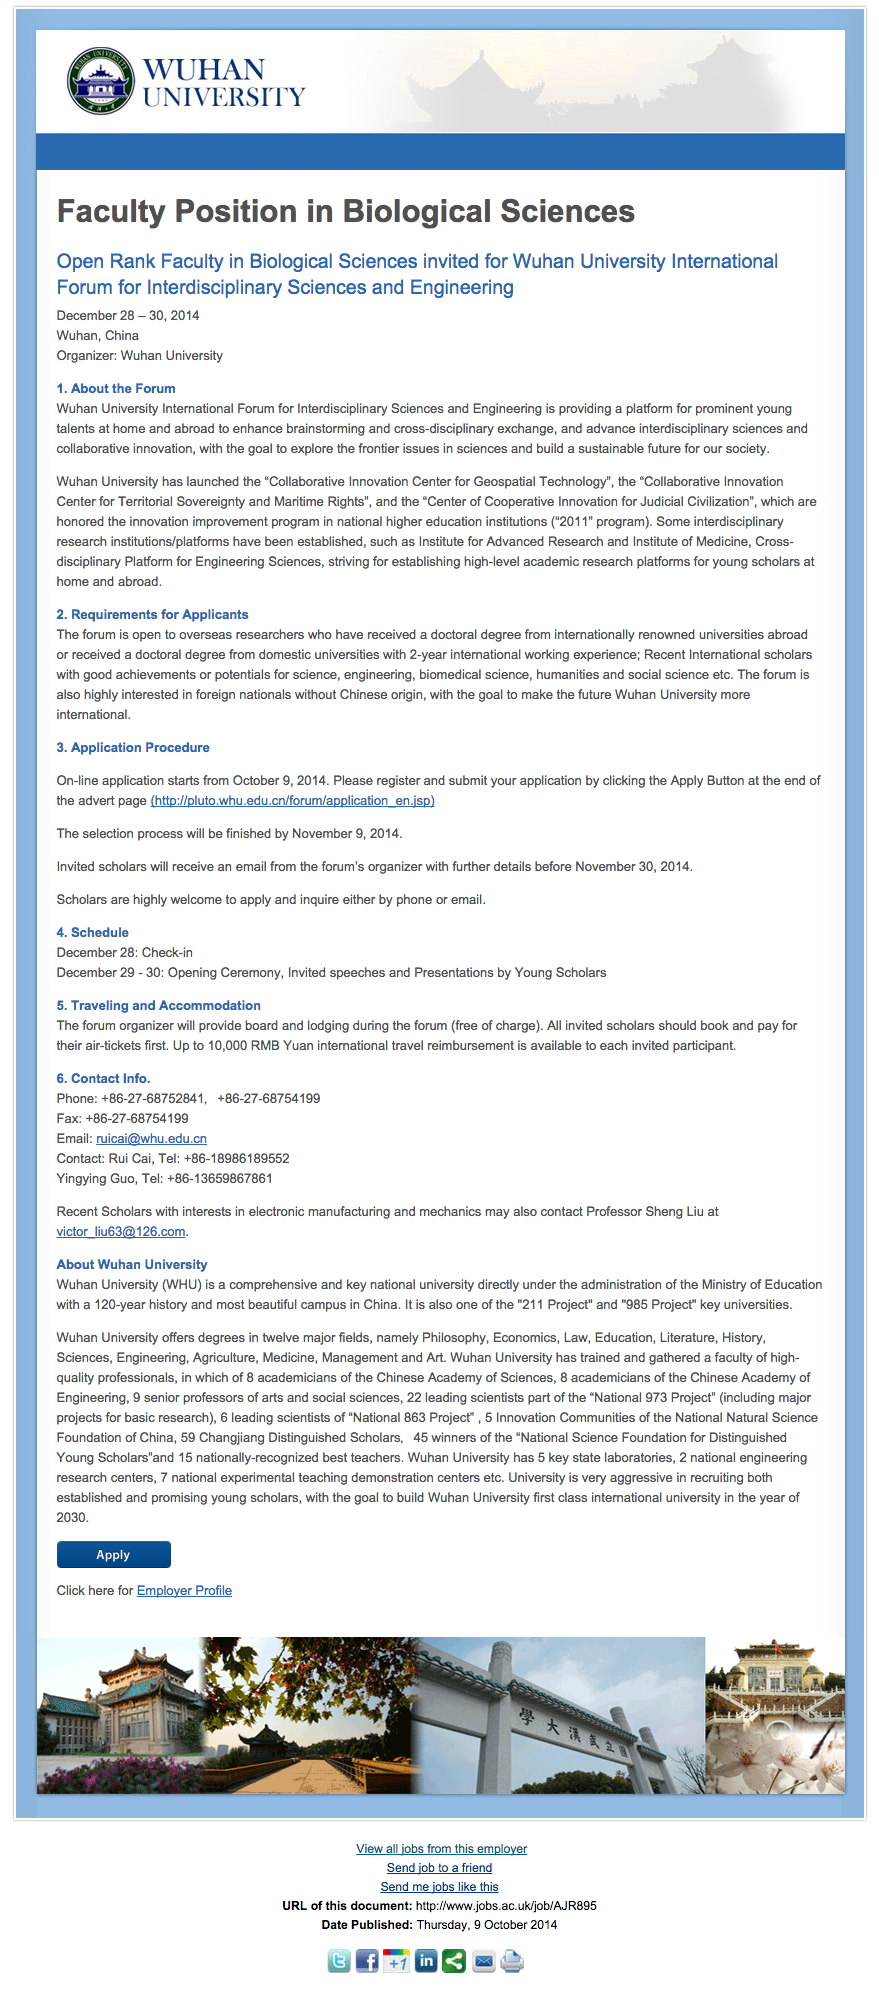 Enhanced Advert Gallery | jobs ac uk